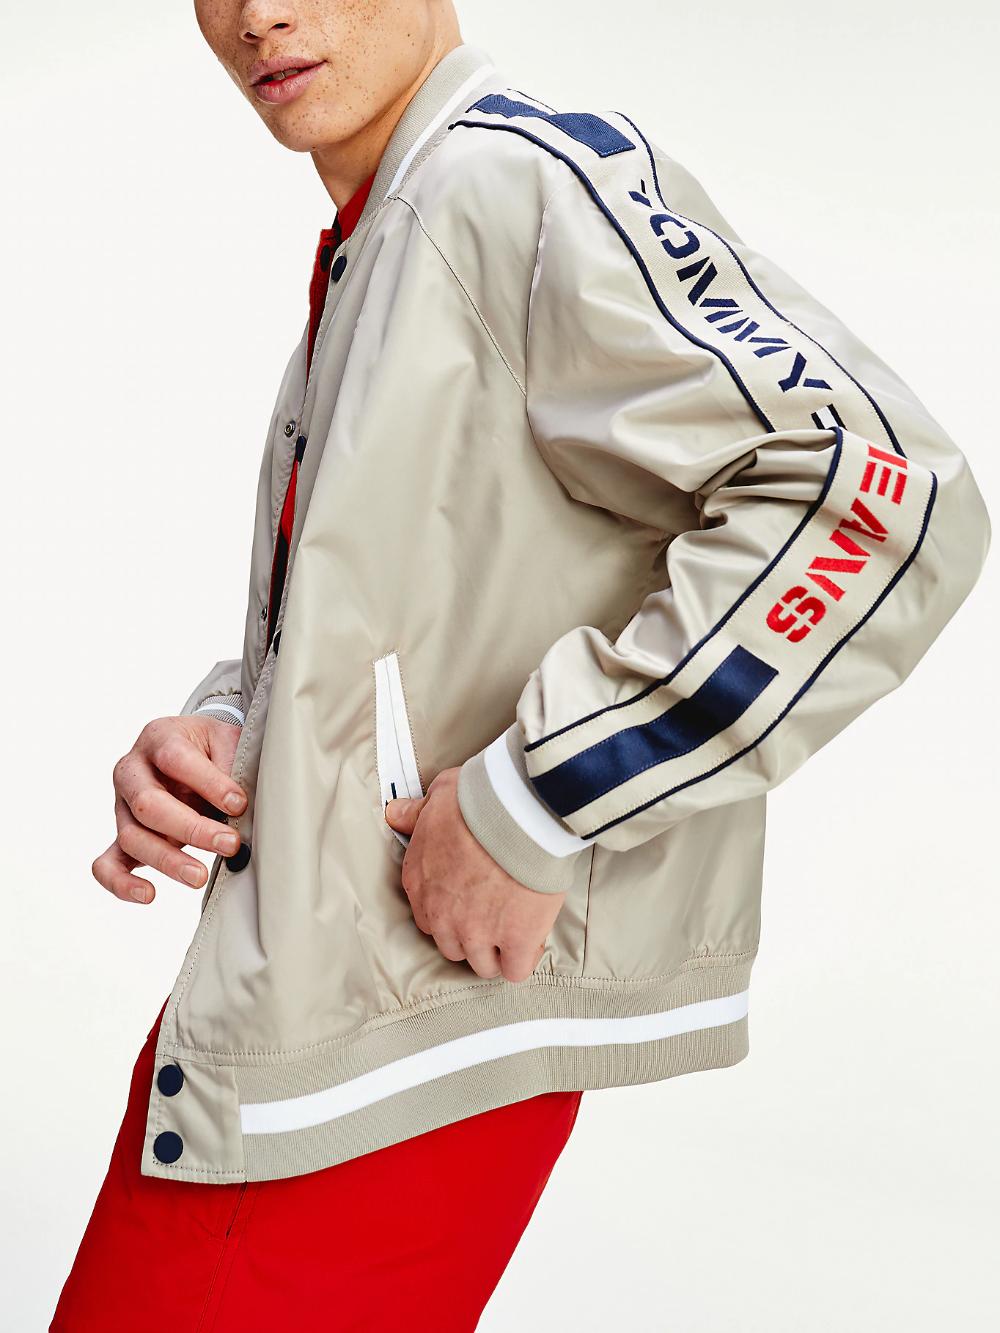 Reversible Bomber Jacket Blue Tommy Hilfiger Outerwear Jackets Jackets Men S Coats Jackets [ 1333 x 1000 Pixel ]